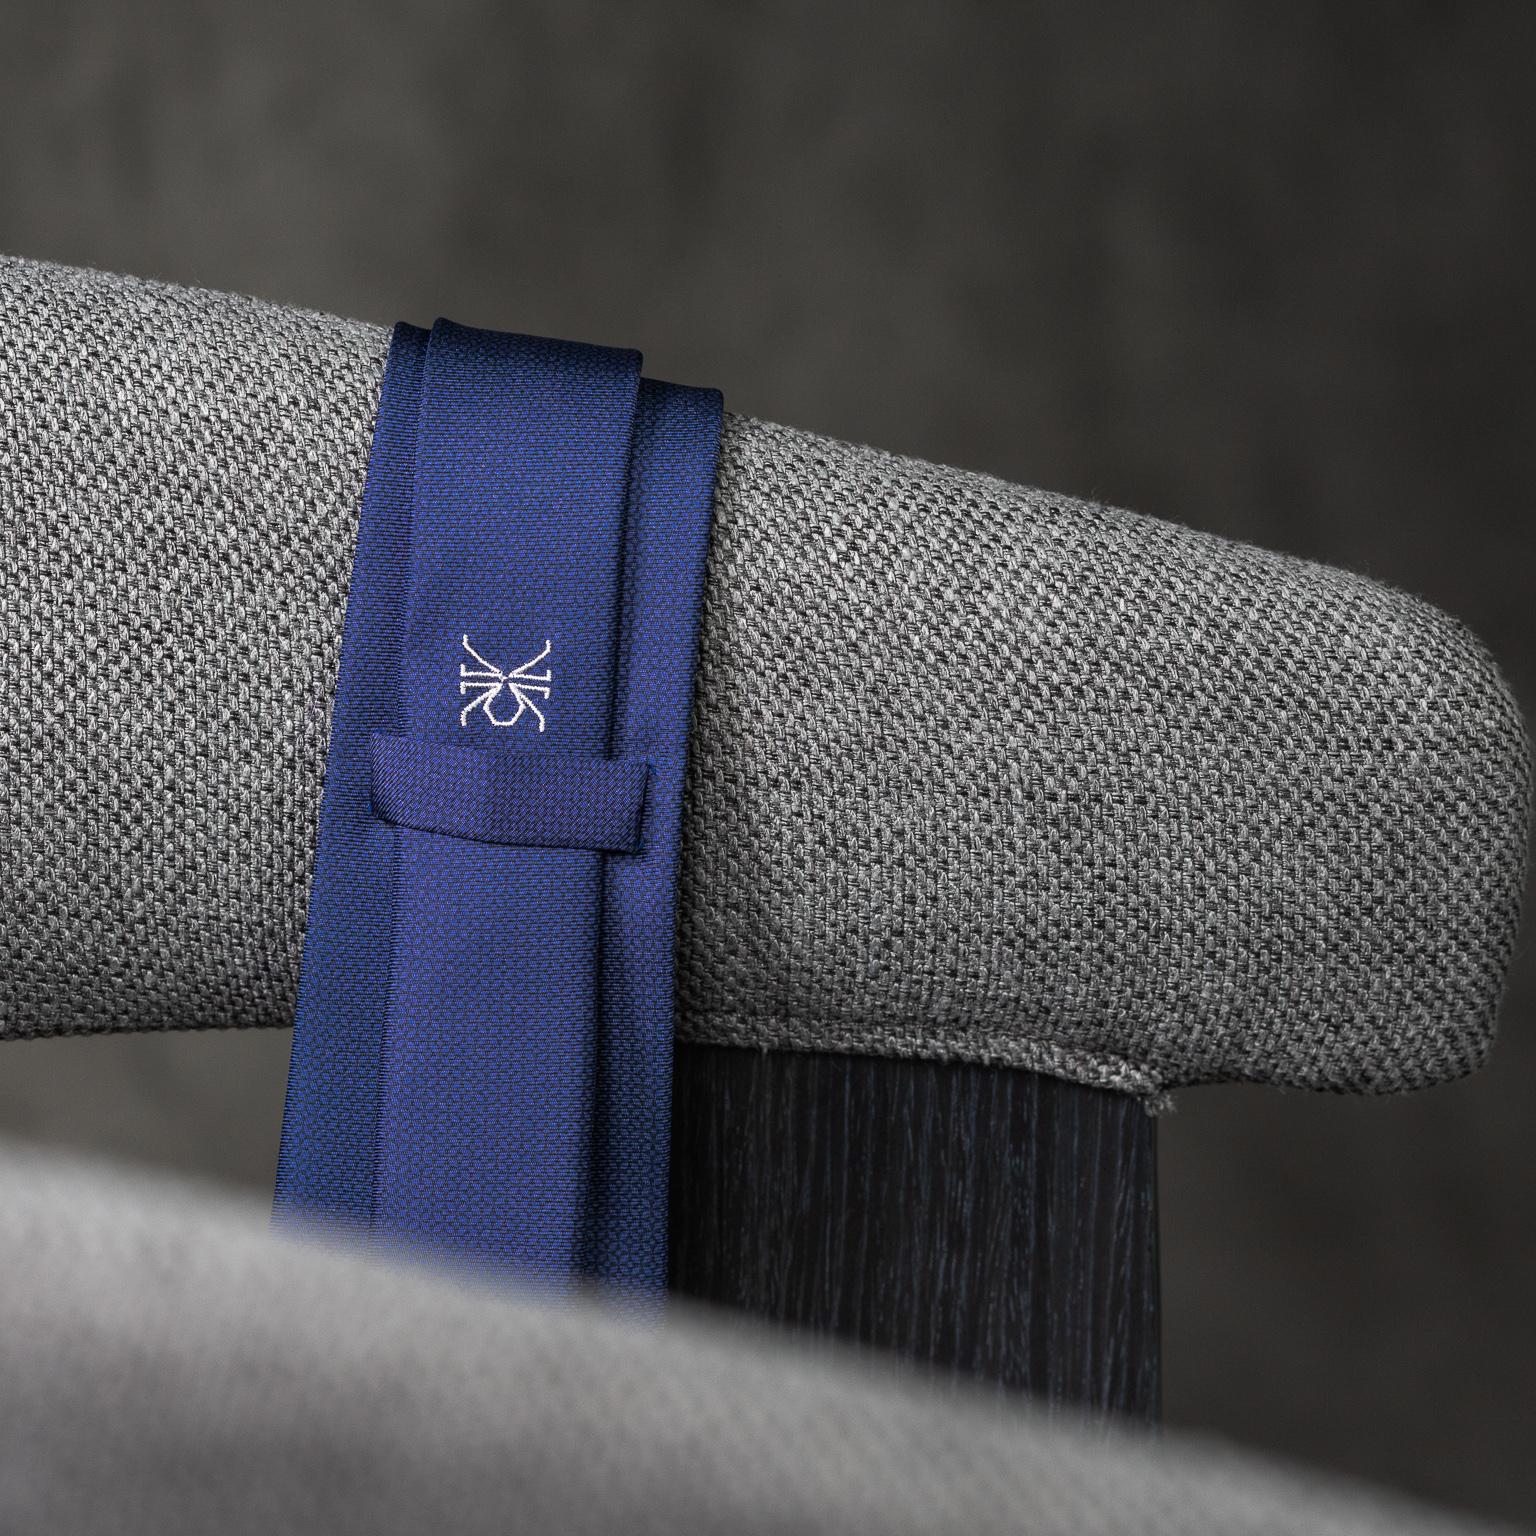 PRINTED-SILK-SEDA-ESTAMPADA-0572-Tie-Initials-Corbata-Iniciales-The-Seëlk-4